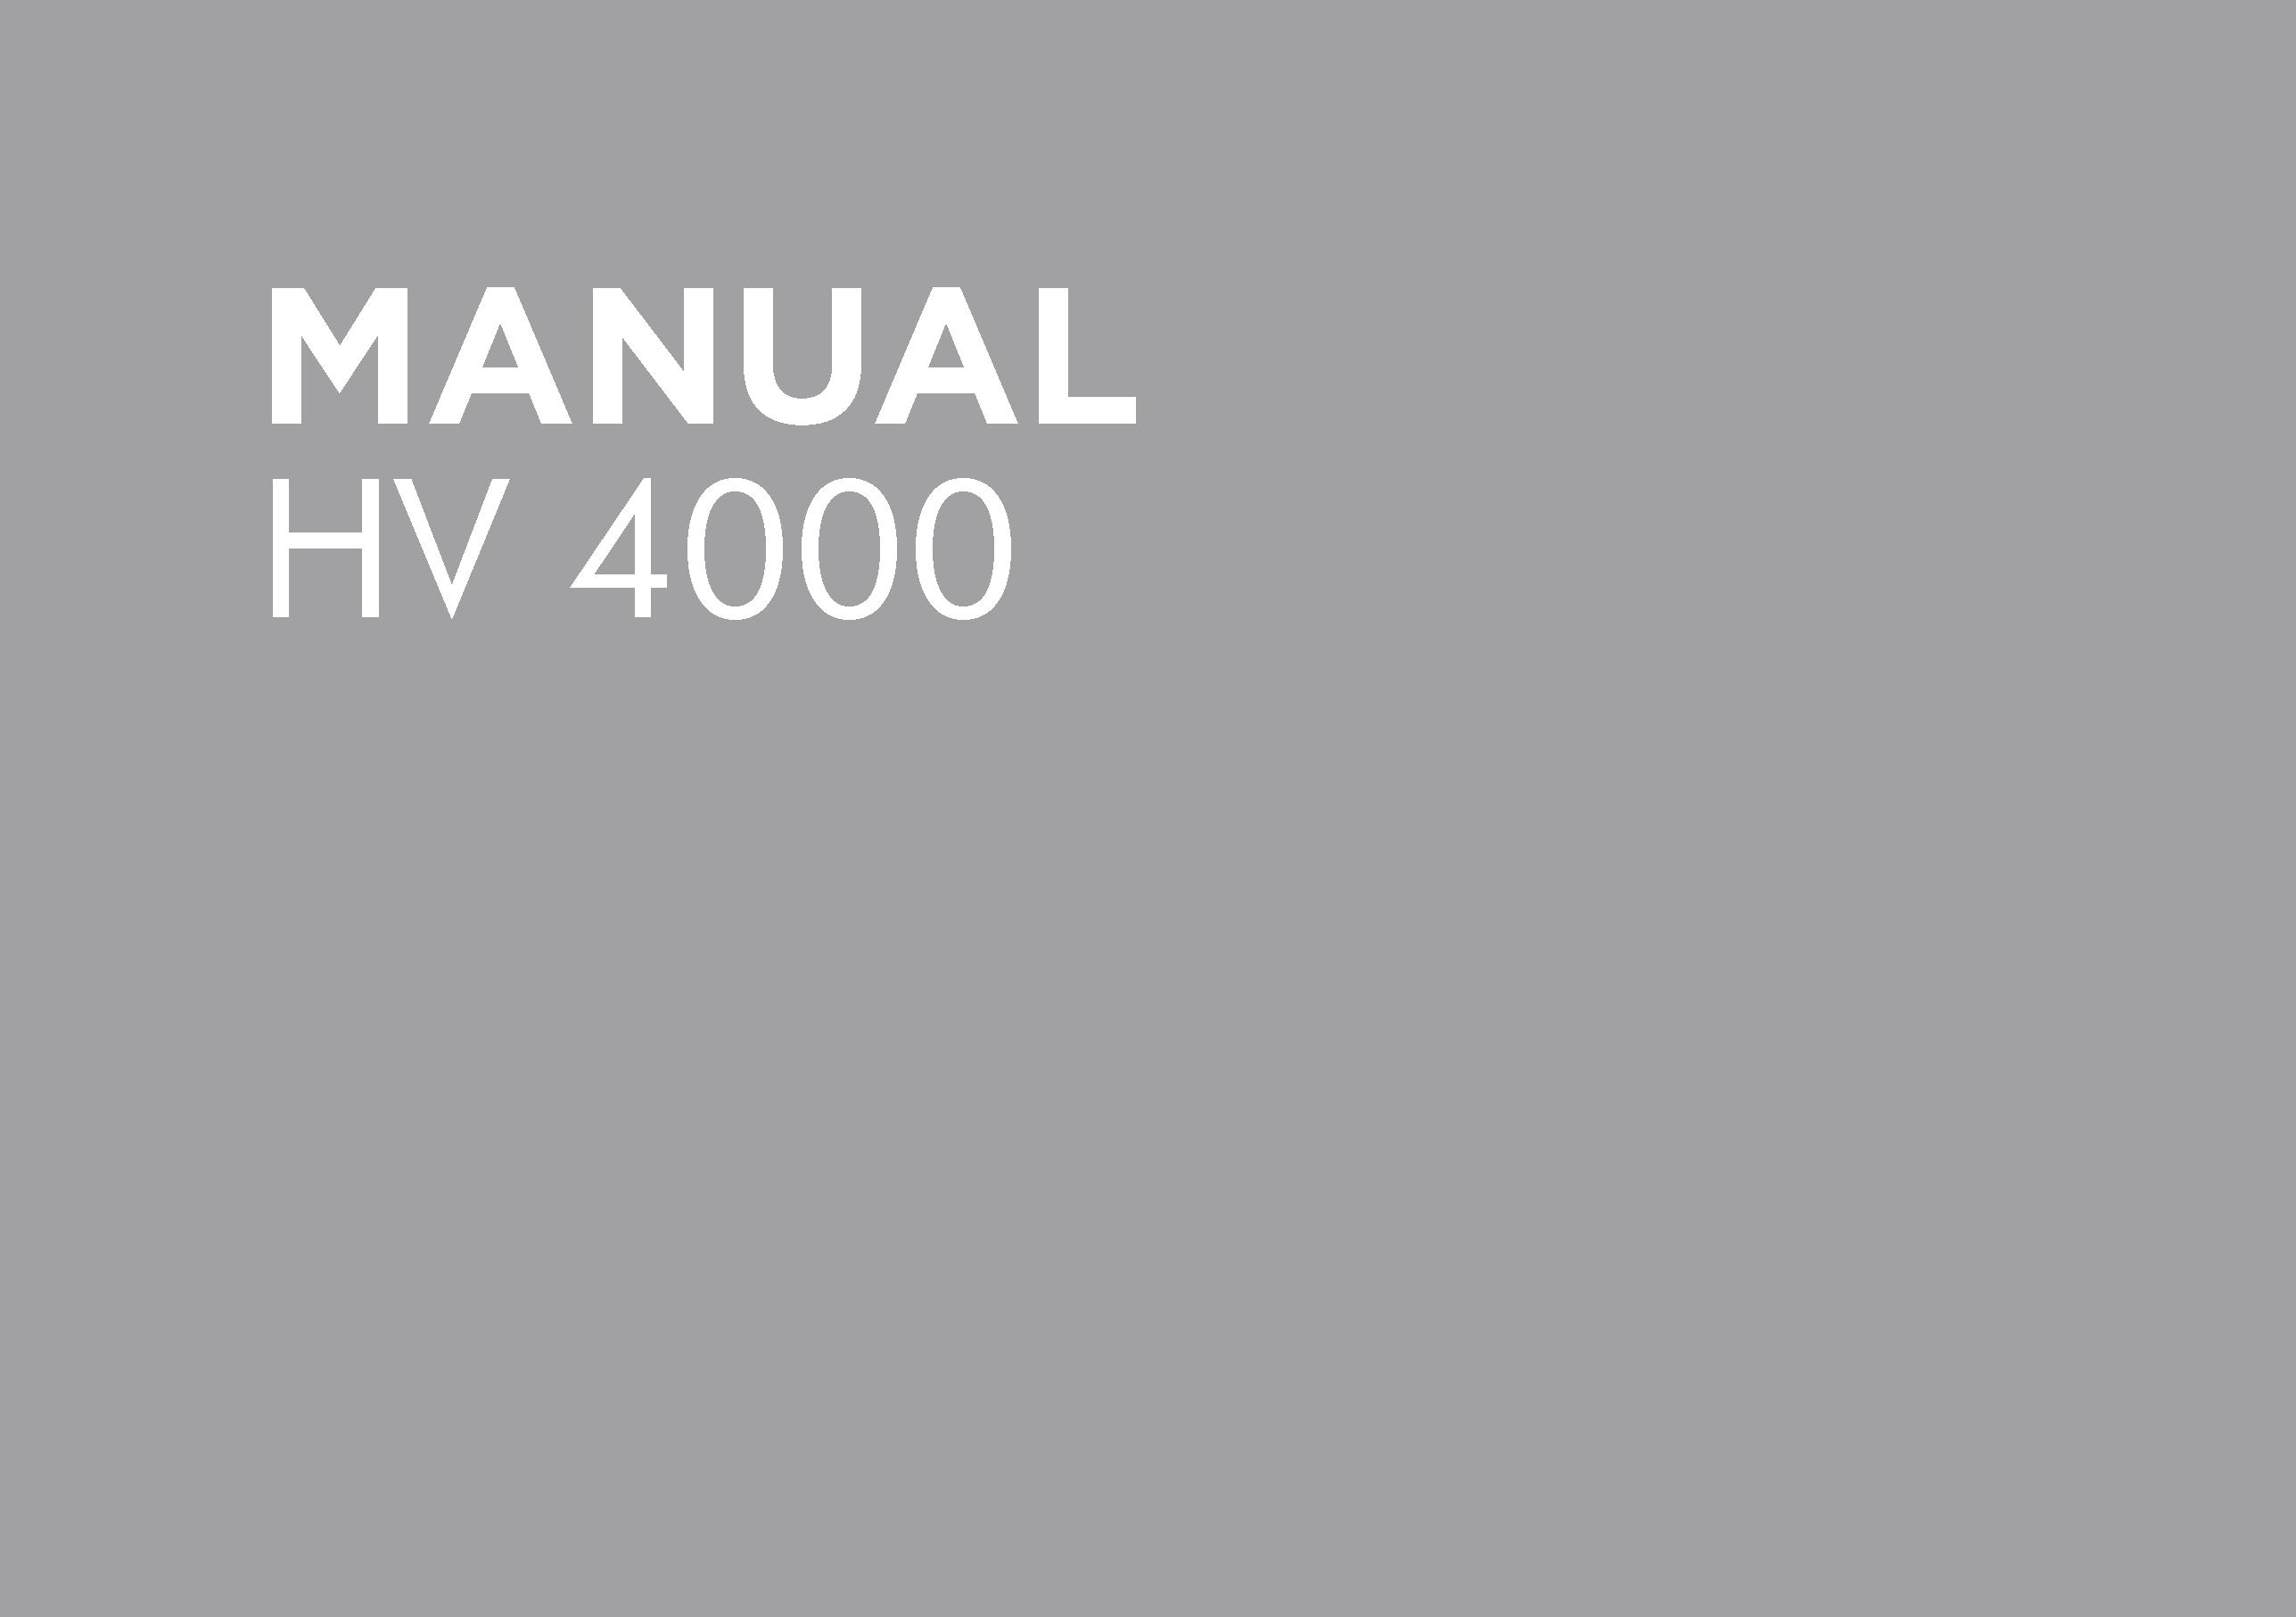 HV4000 Operators Manual